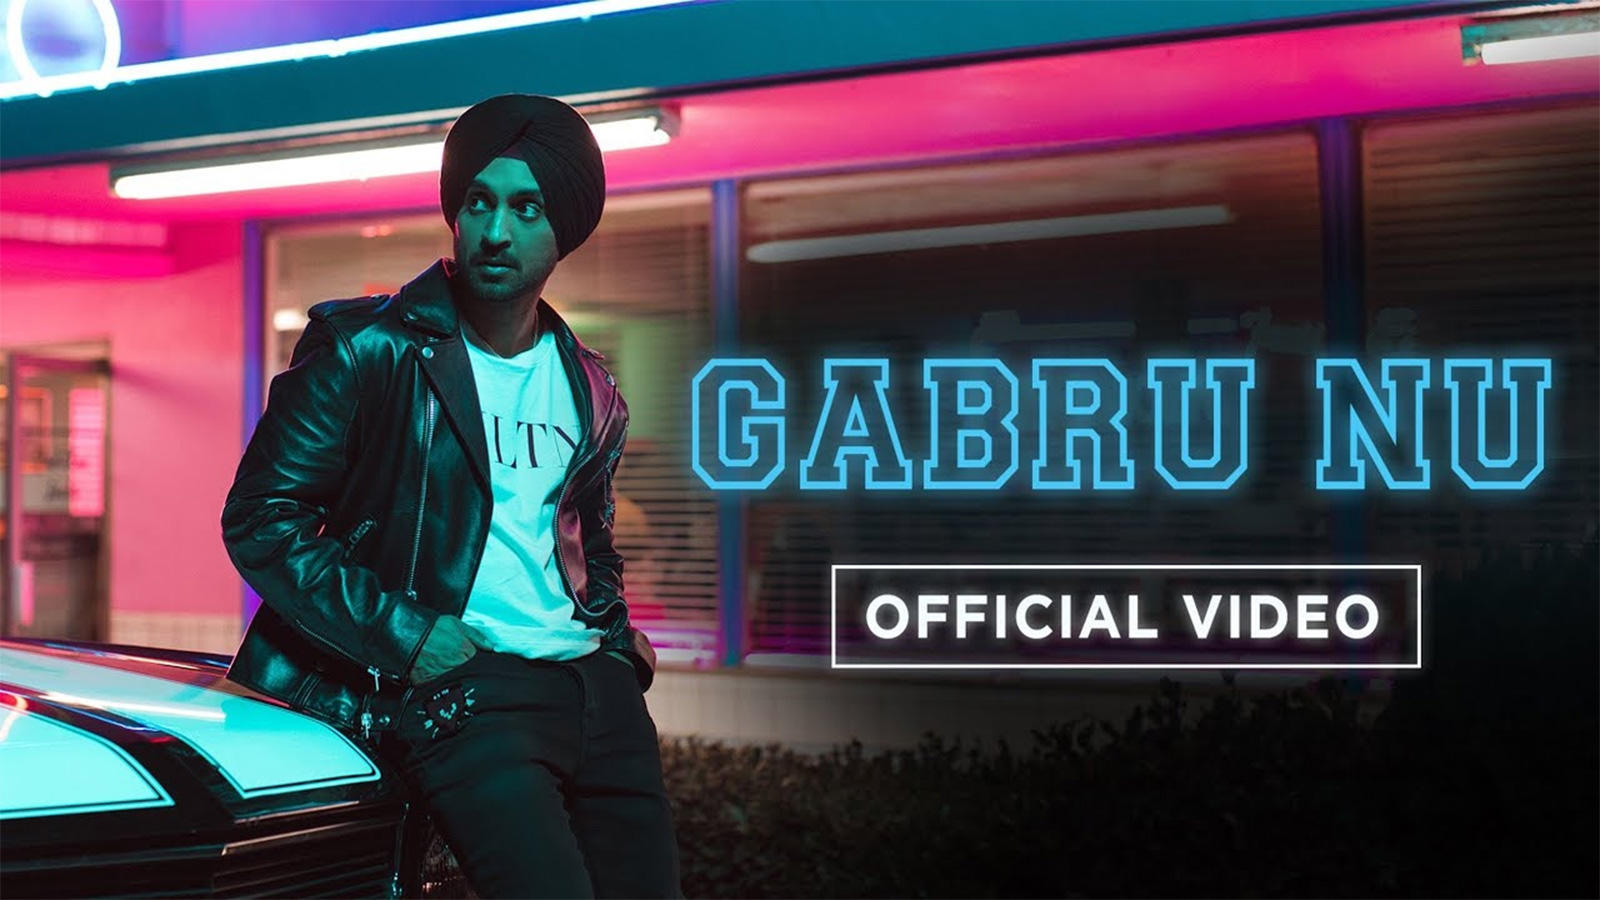 Latest Punjabi Song Gabru Nu Sung By Diljit Dosanjh